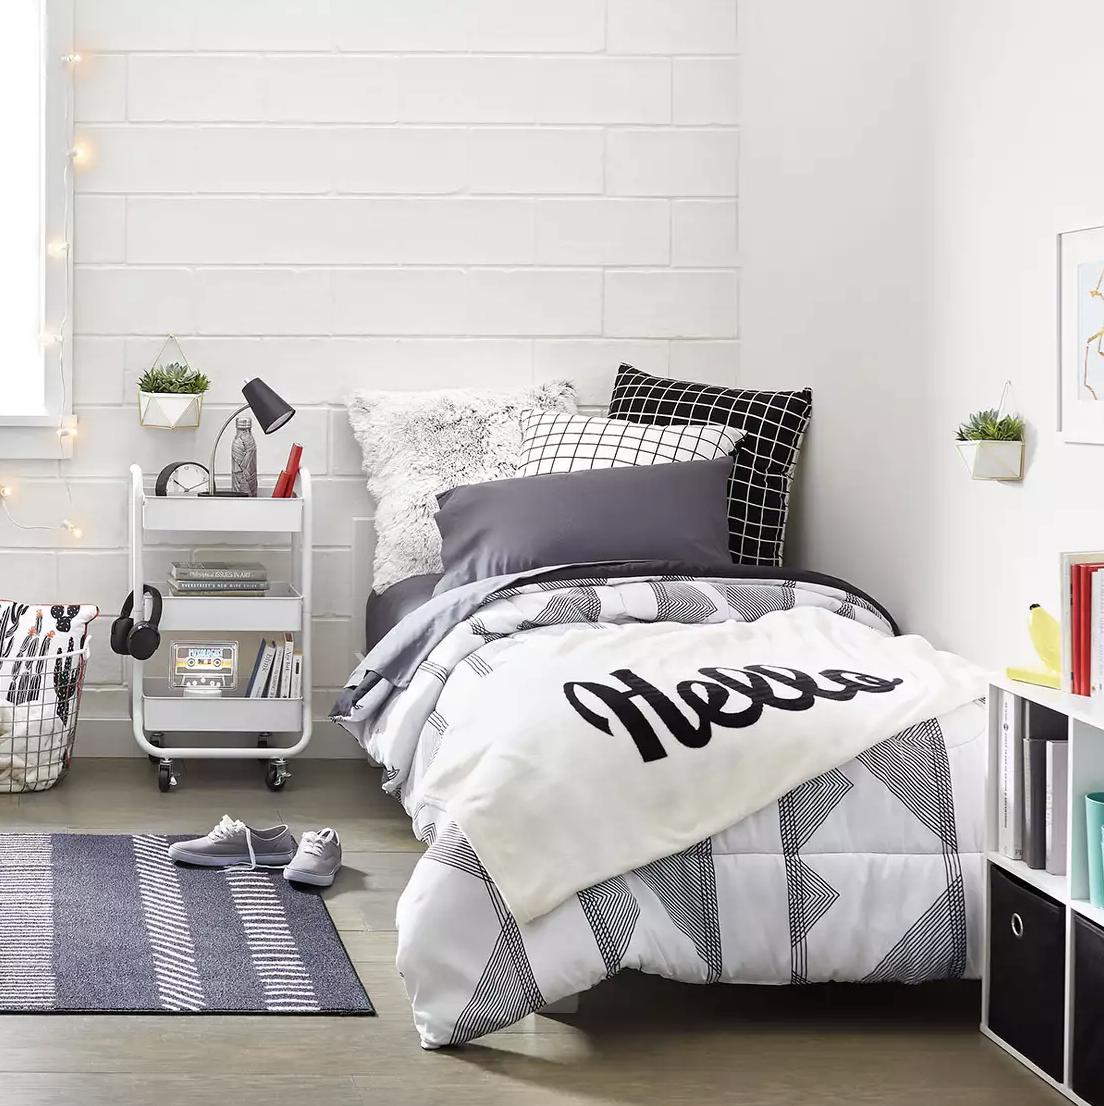 Best 31 Cozy Dorm Room Bed Risers Dormroominspiration 640 x 480